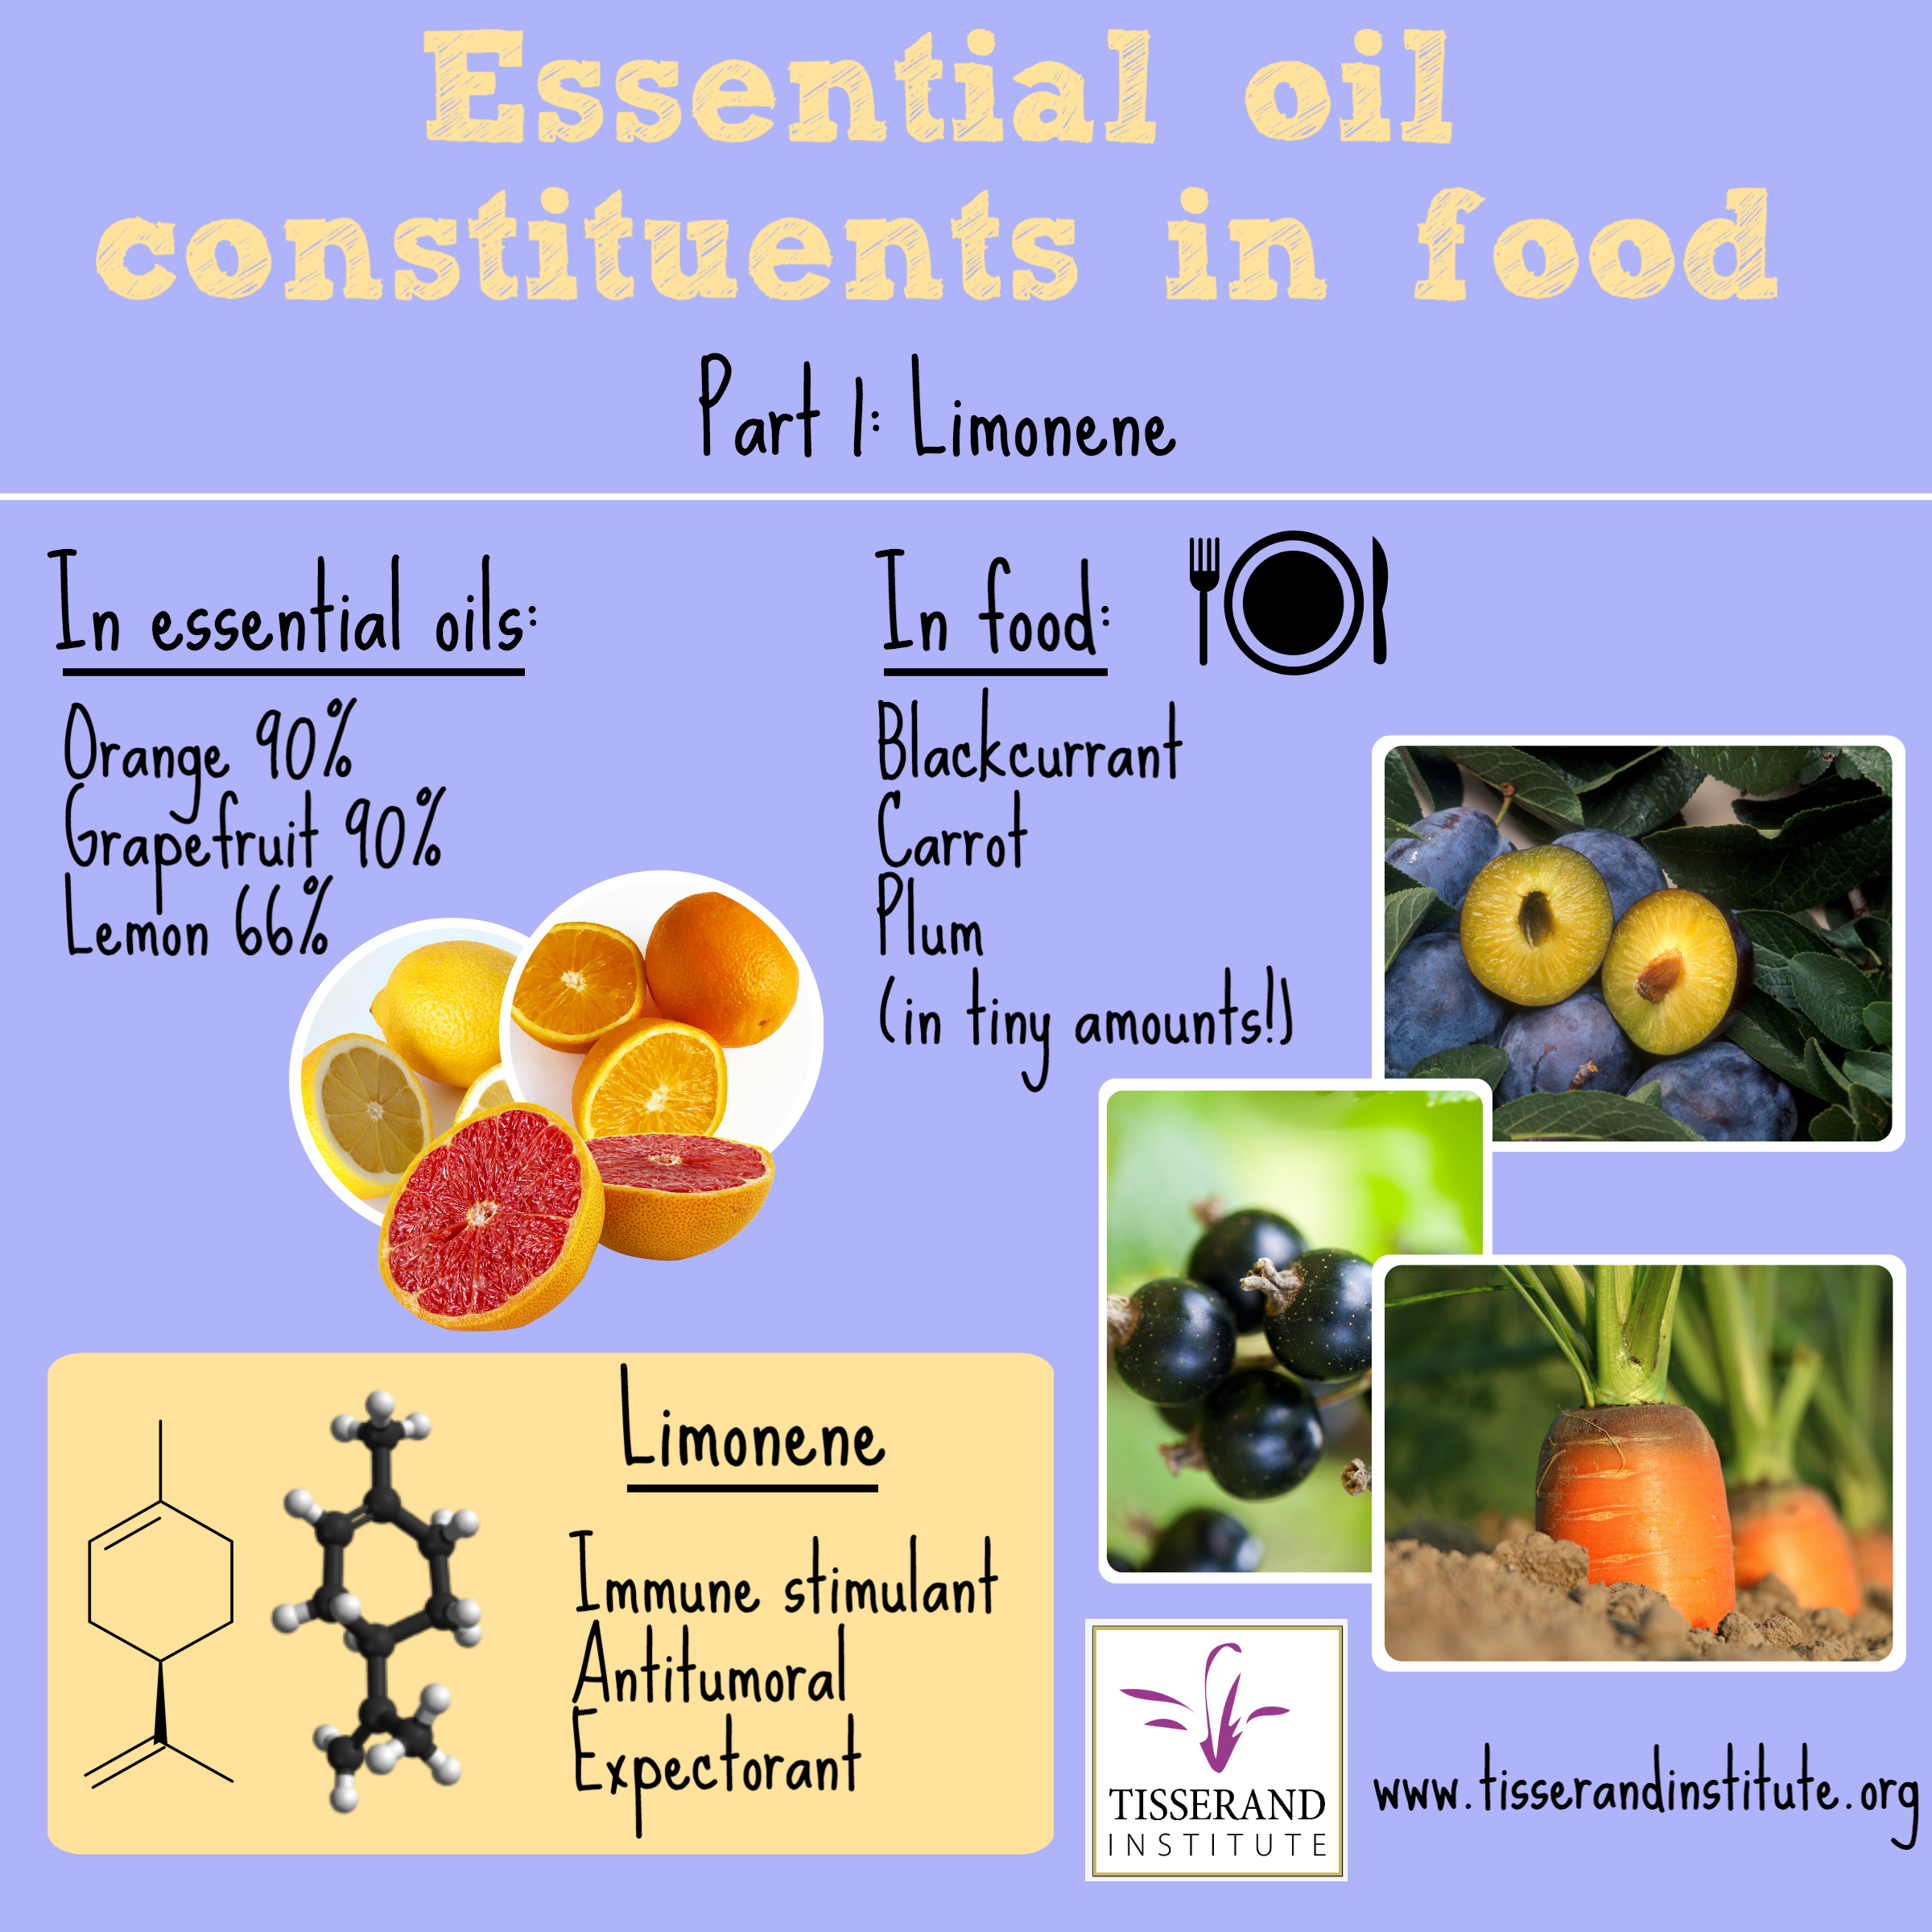 Limonene Essential Oil Constituents in Food Part 1